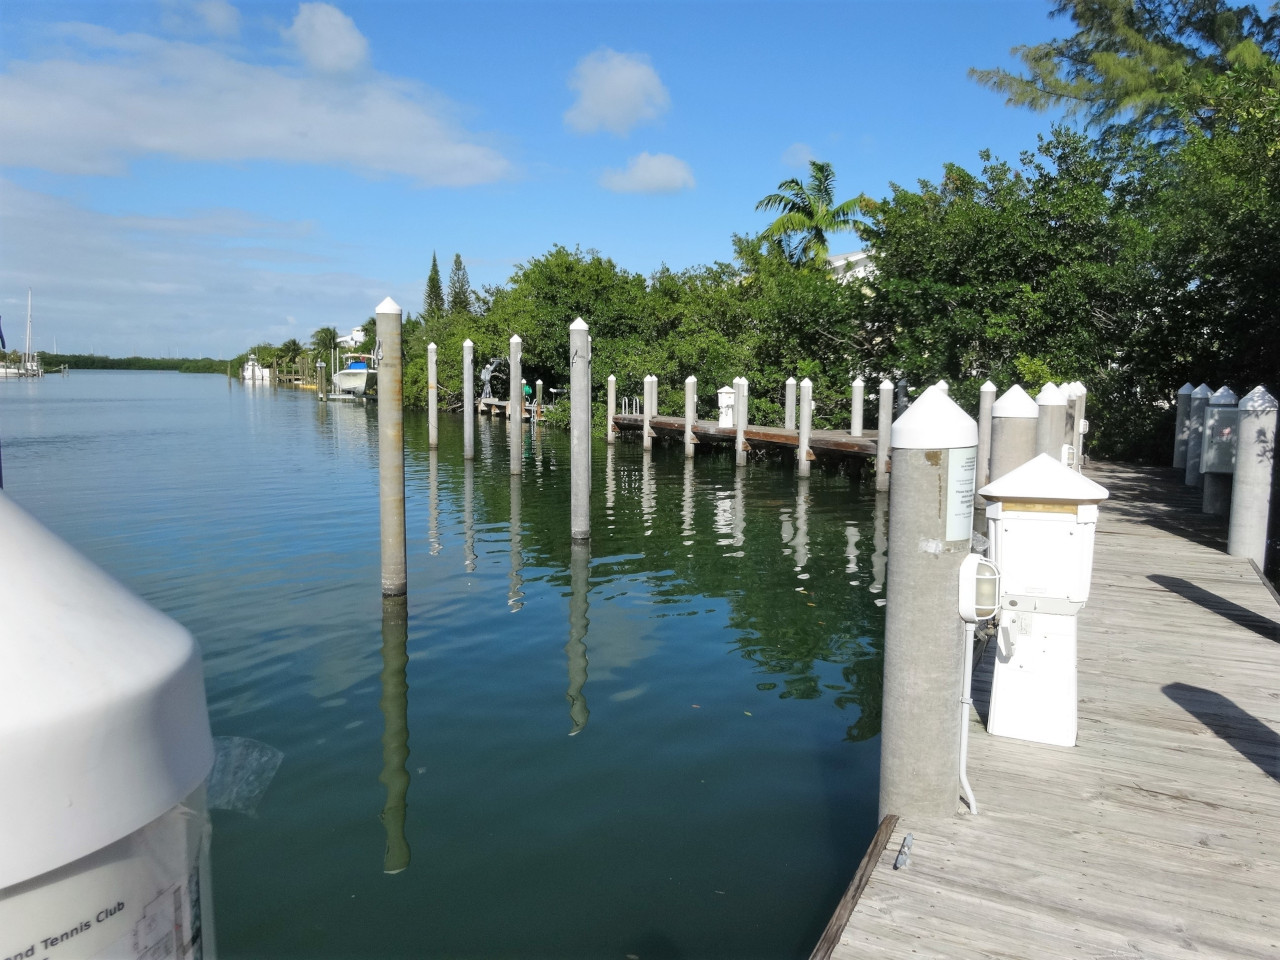 CocoPlum-Boat-Docks-16-Large.JPG